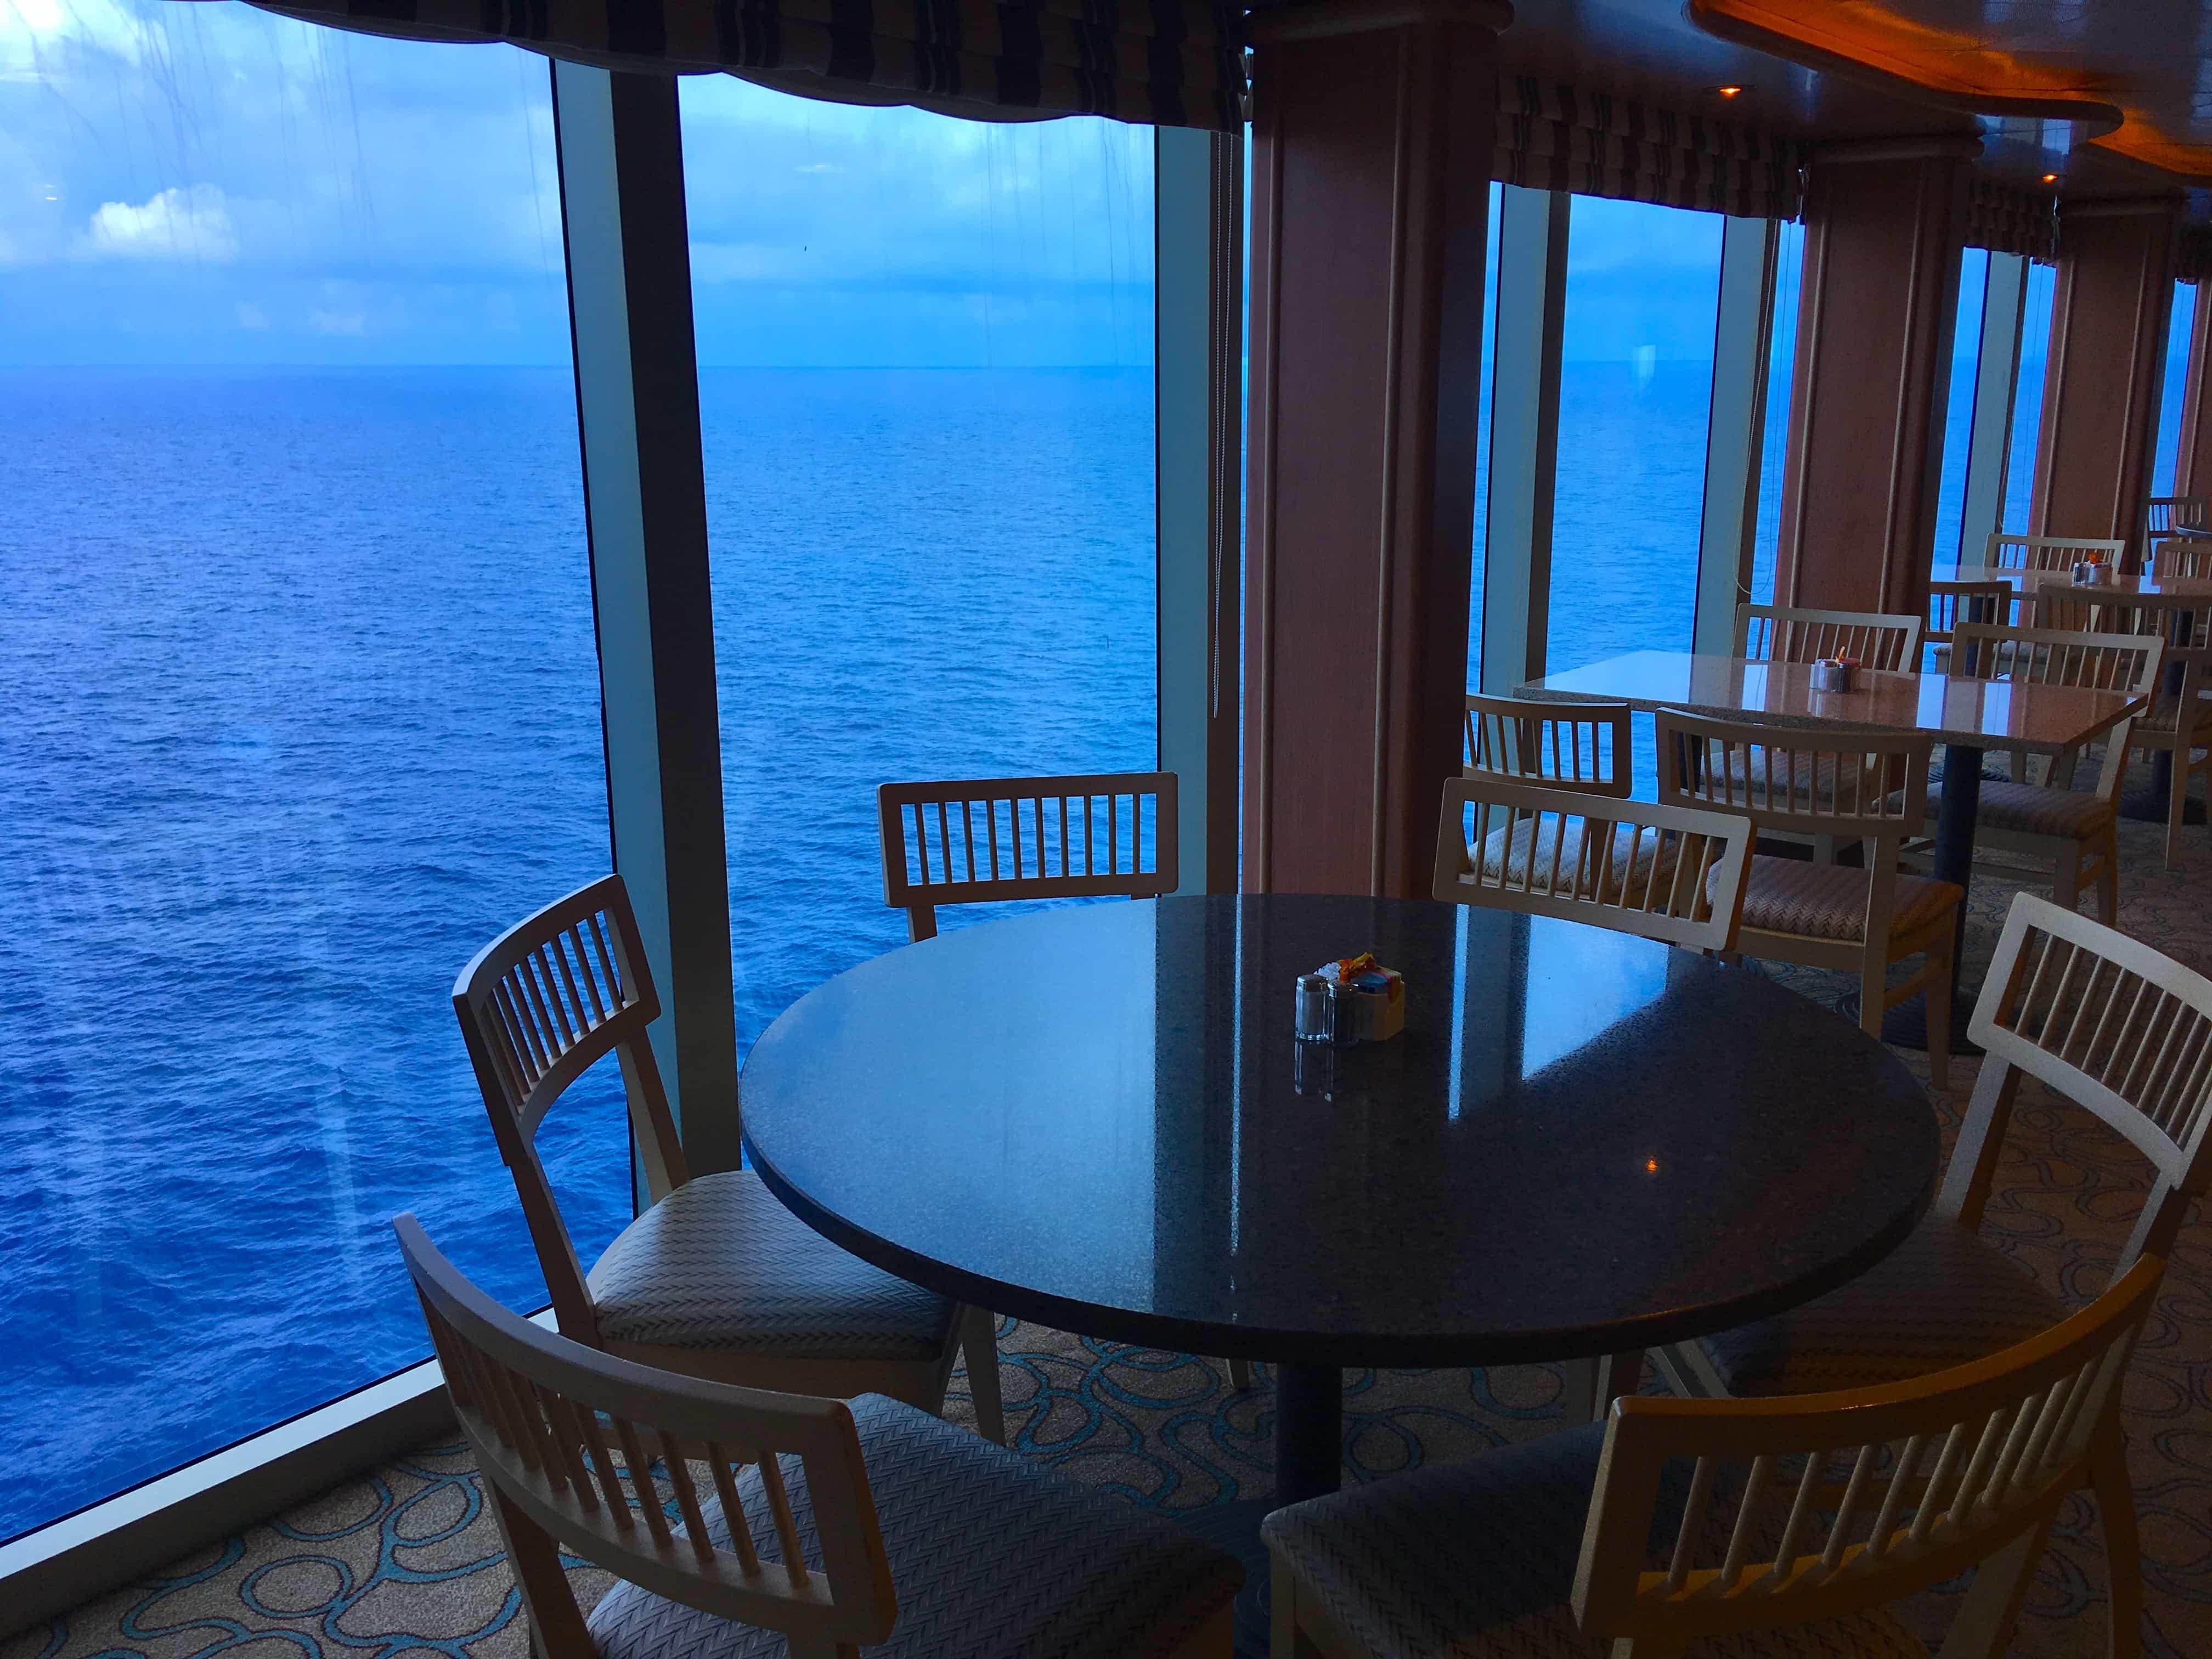 buffett golden princess table ocean view cruise ship